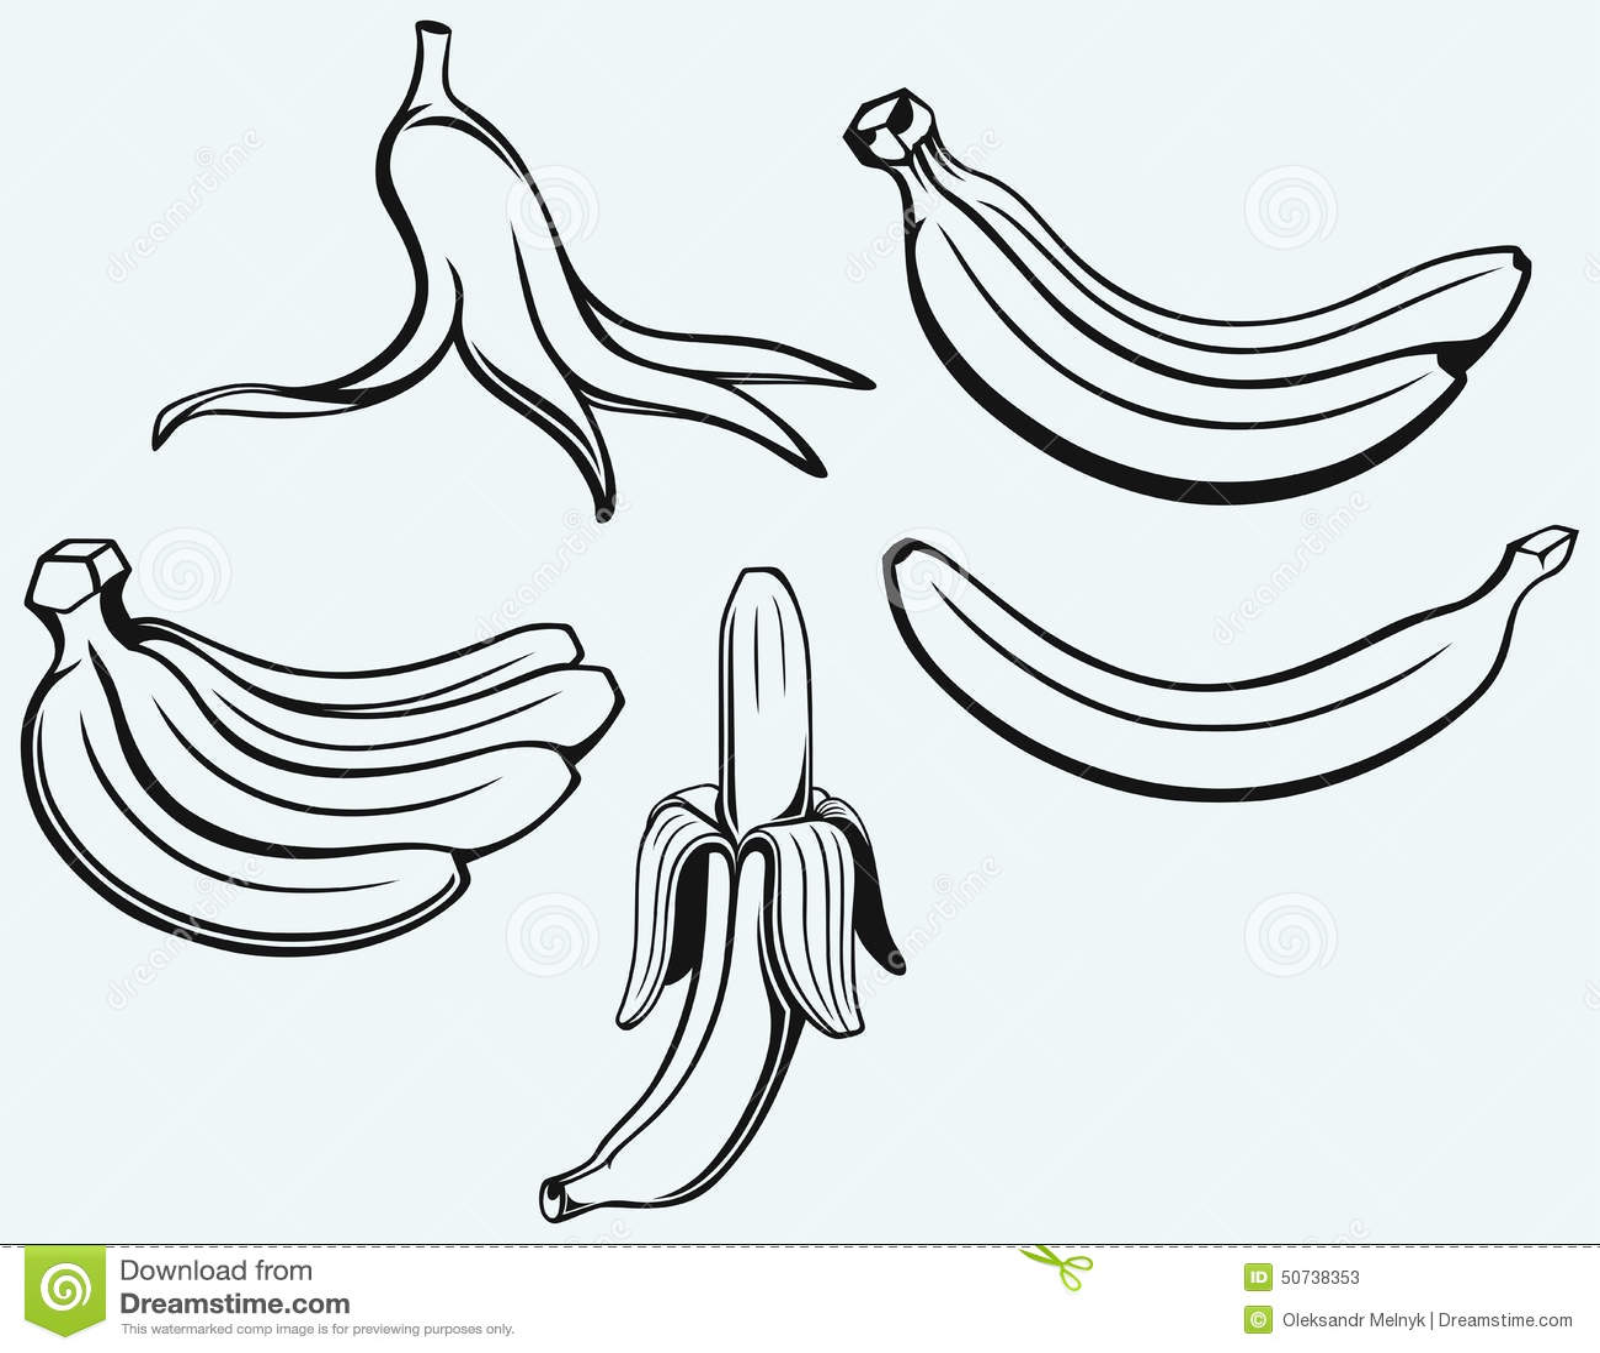 Bunch Of Bananas Peeled Banana And Banana Peel Stock